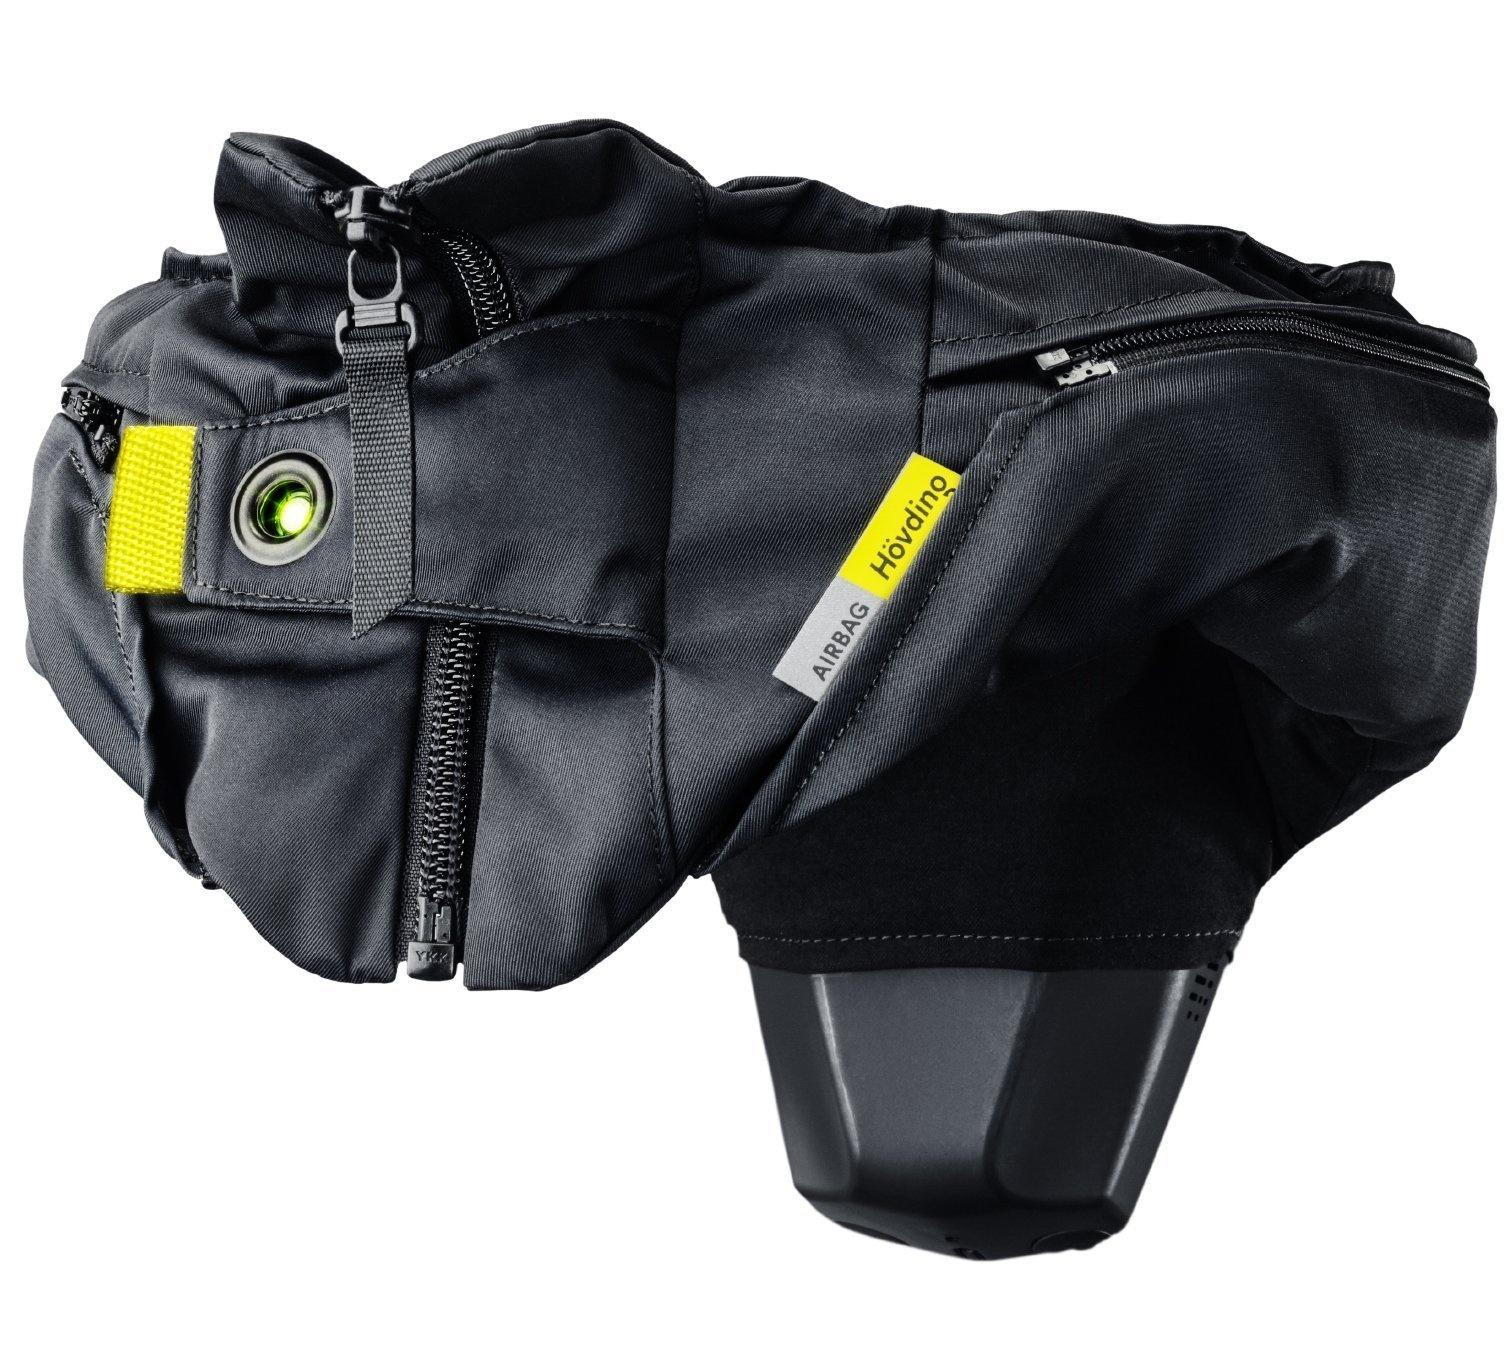 Hövding 3.0 Airbag Cykelhjelm - Cyklist Airbag